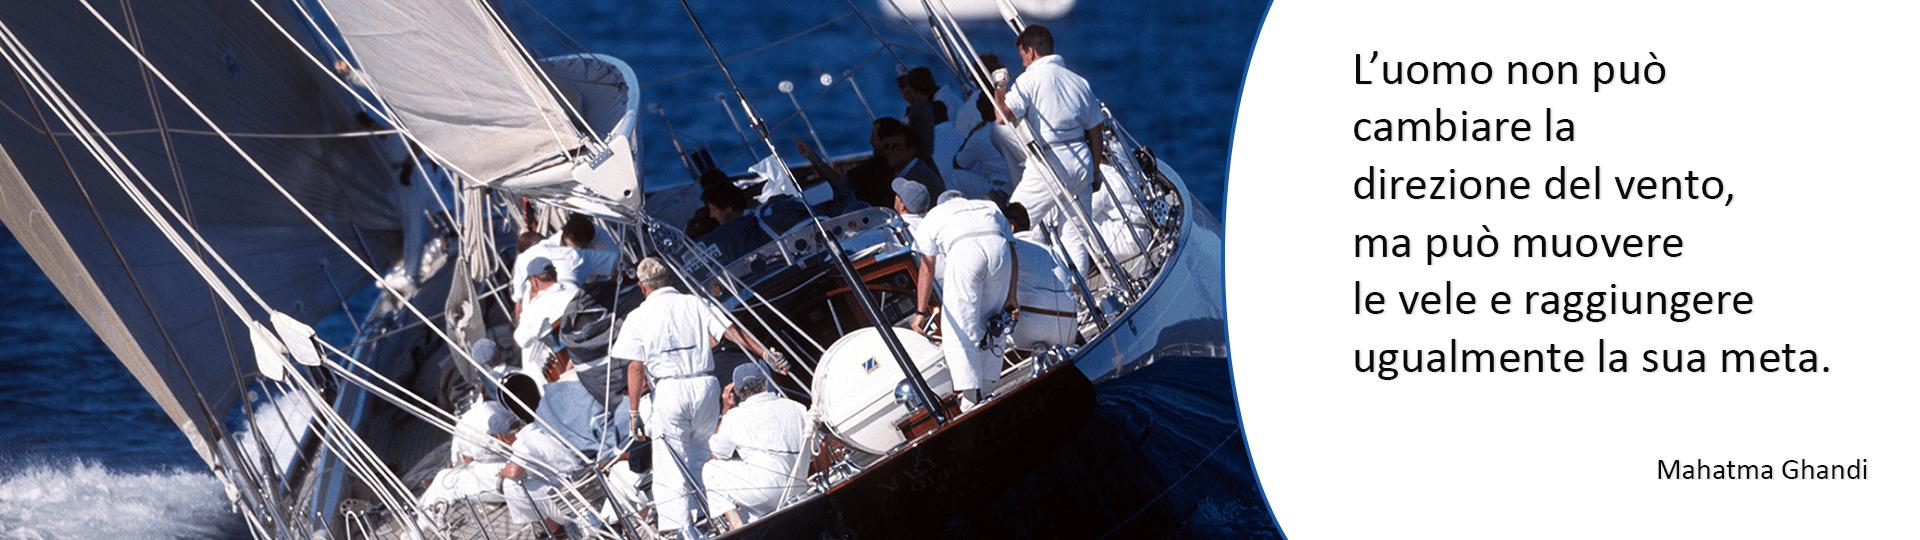 adm-slide-barca